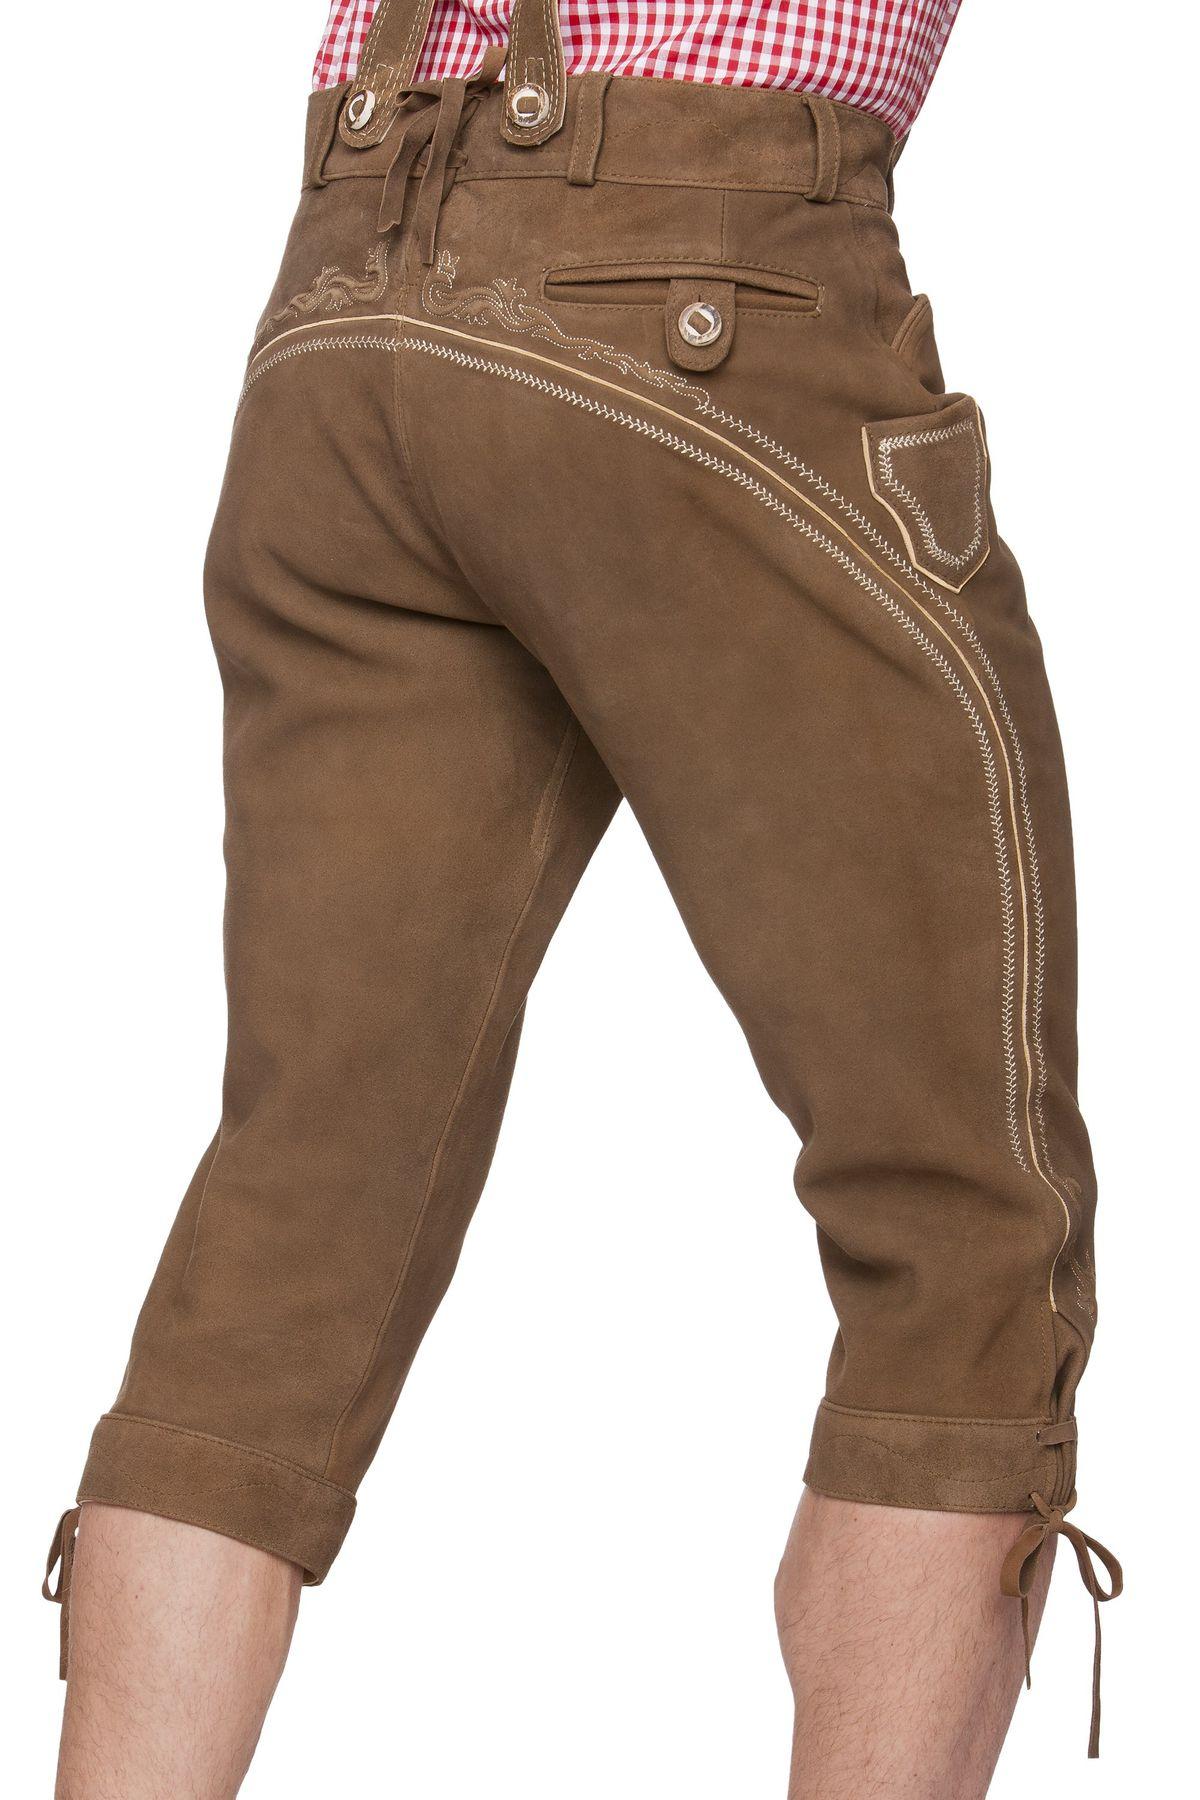 Stockerpoint - Herren Trachten Lederhose, Art. Justin2 – Bild 5